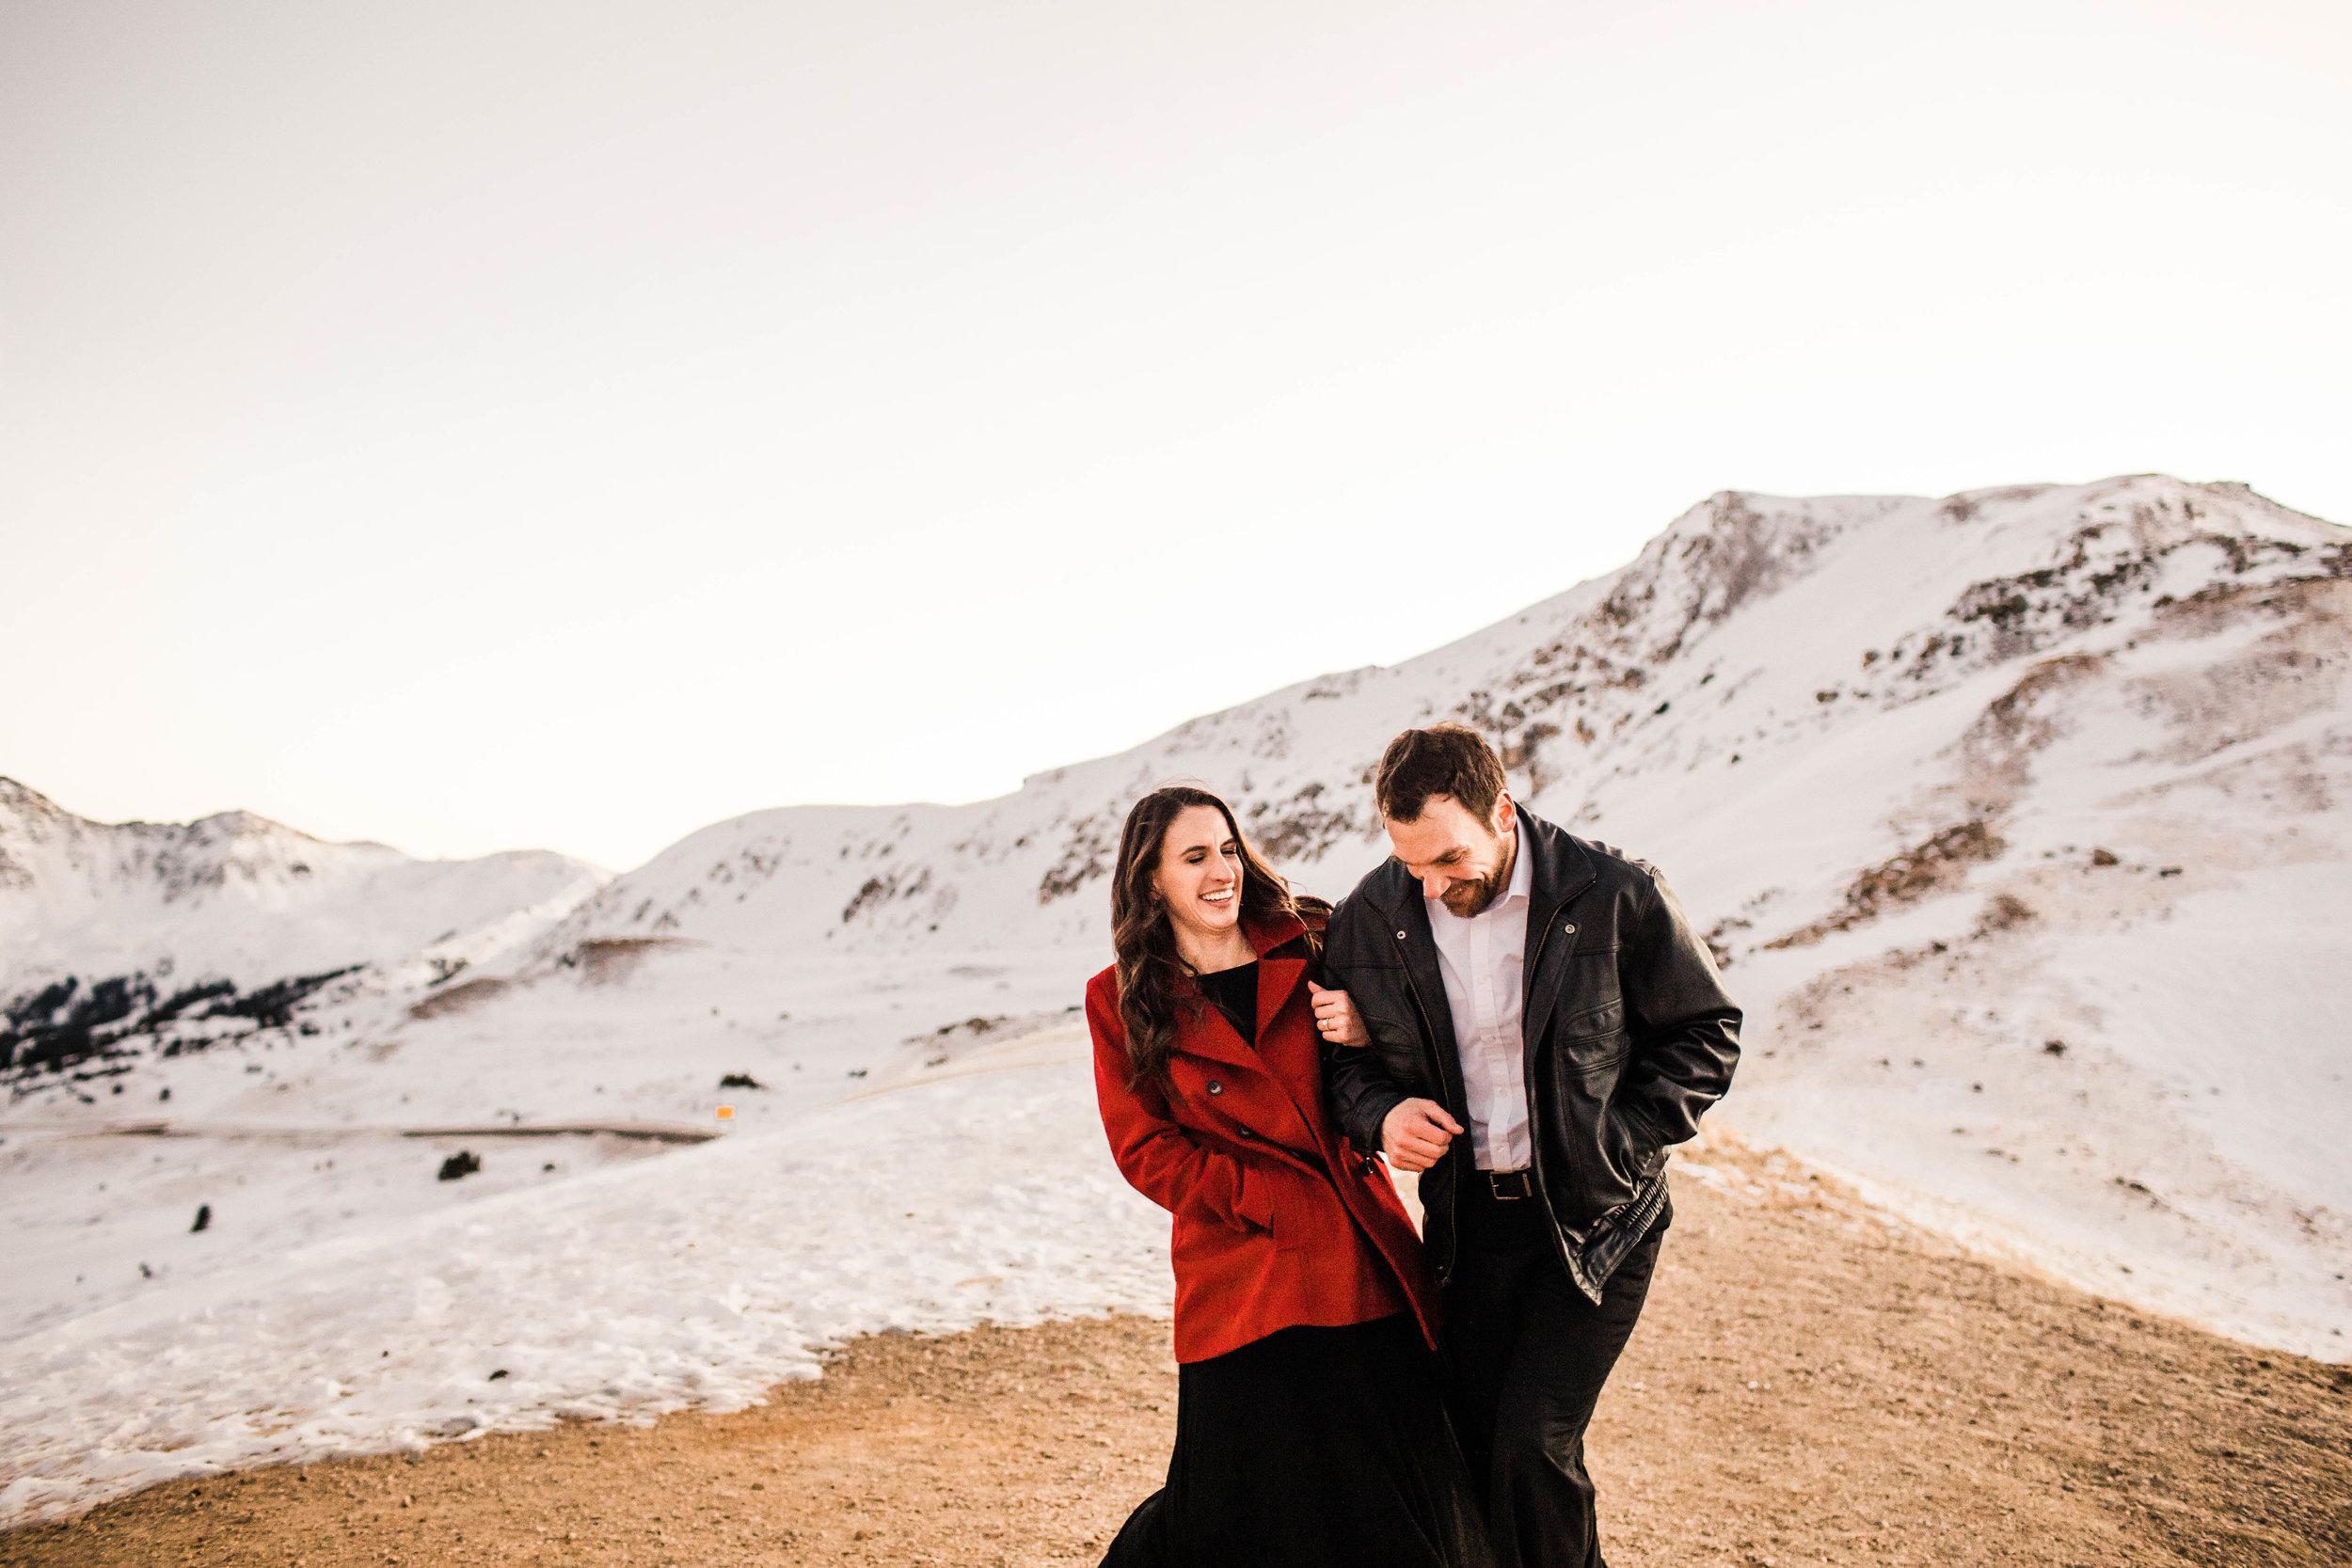 Running in the Rocky Mountain snow   Top Colorado adventure wedding photographer